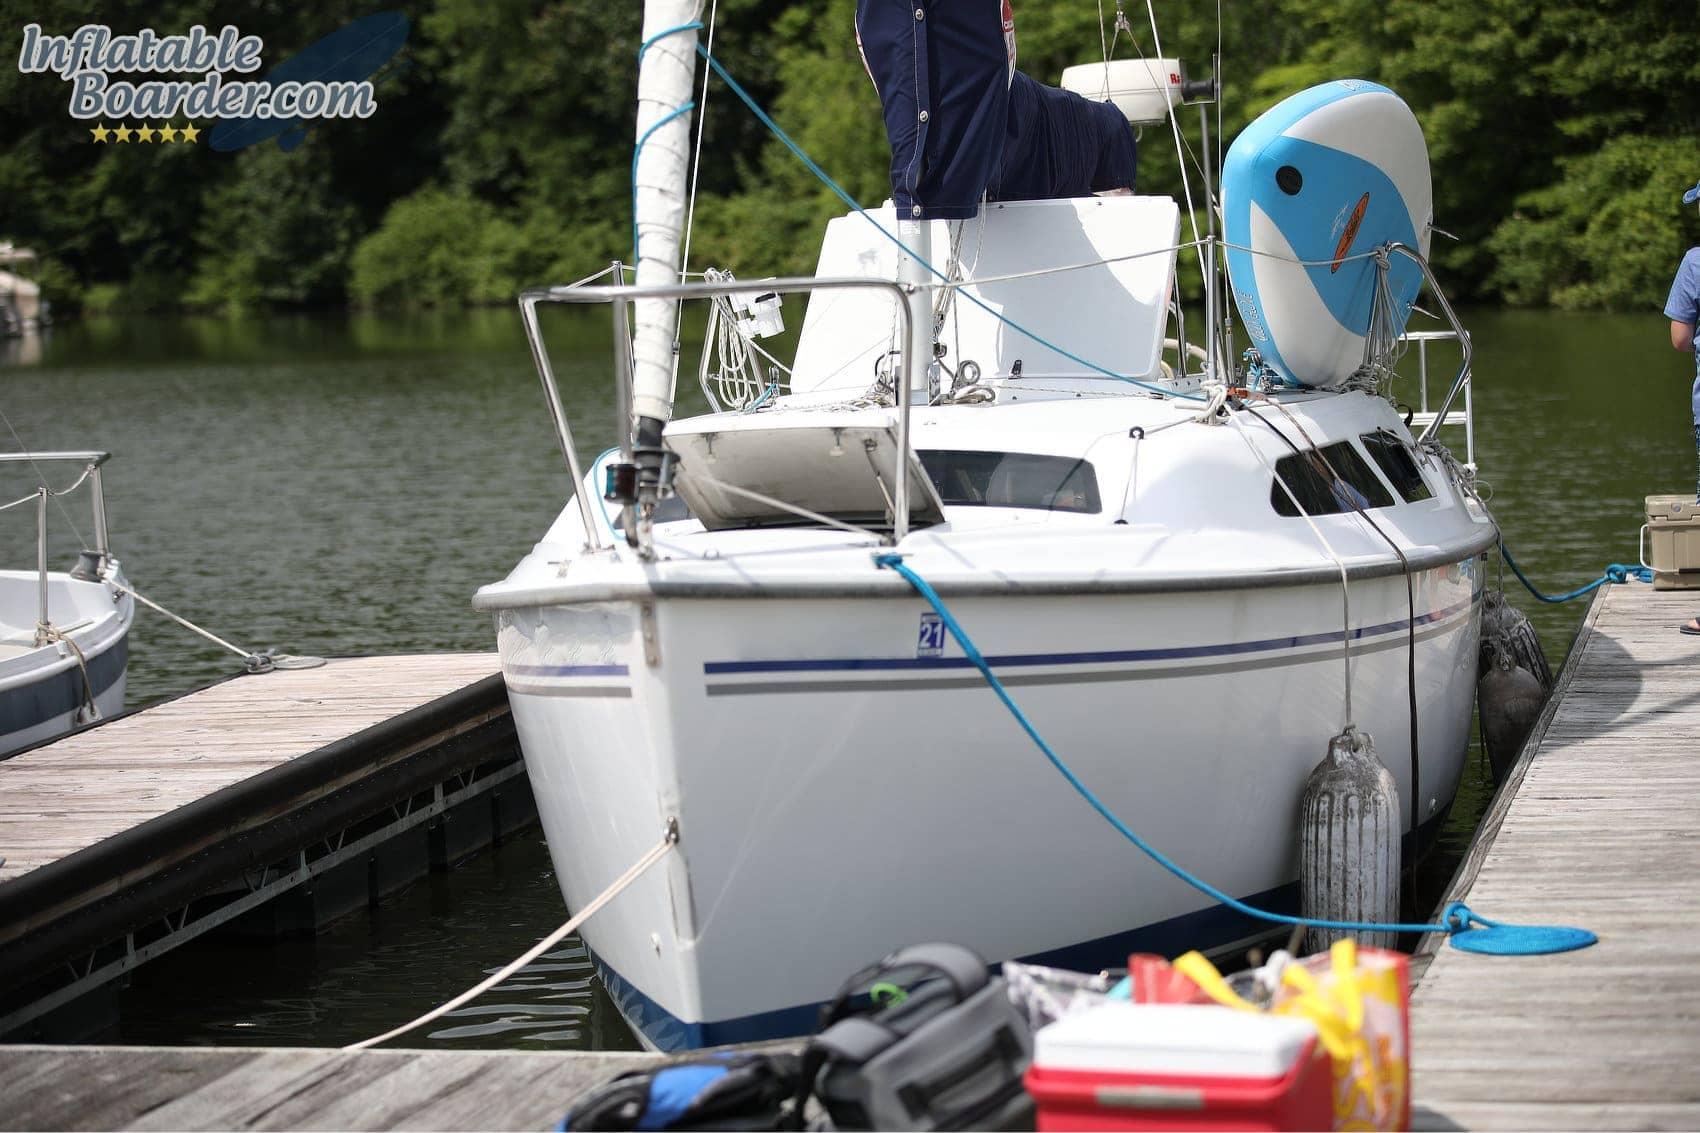 Body Glove iSUP on Boat